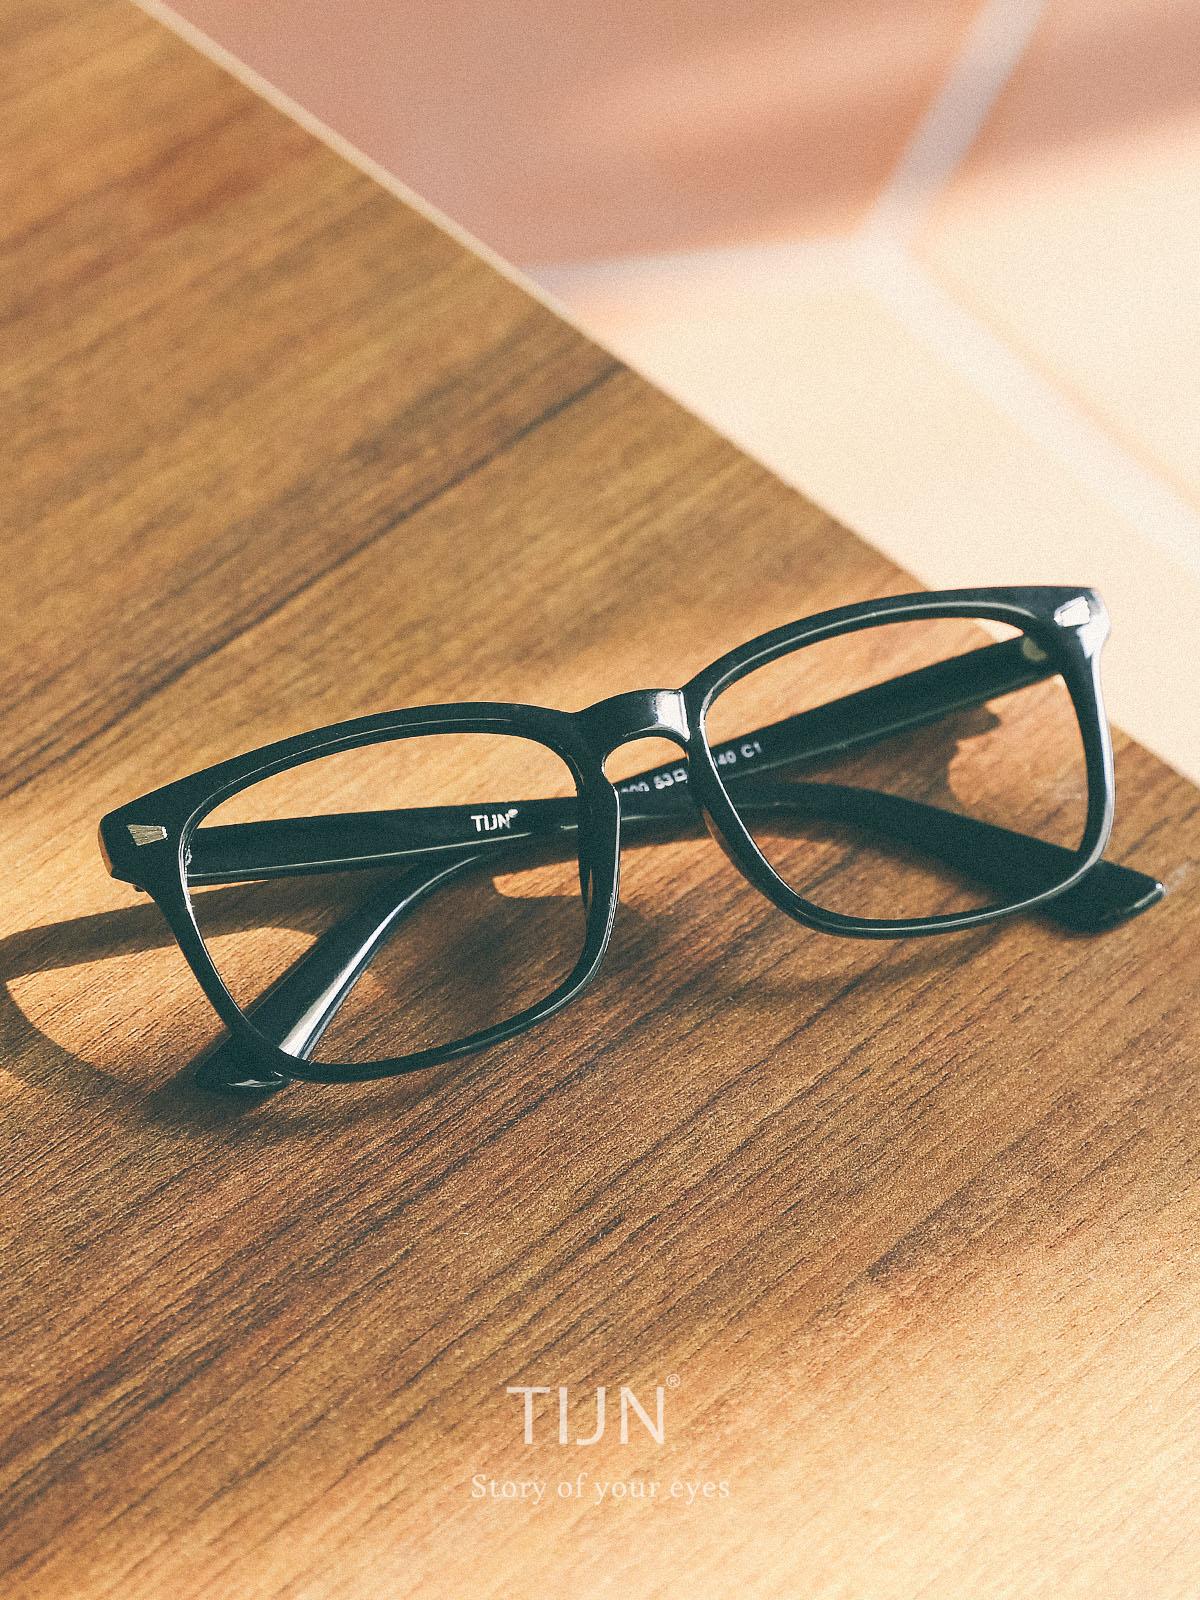 TIJN Unisex Wayfarer Non-prescription Glasses Frame Clear Lens Eyeglasses [Black, Transparent] $9.25